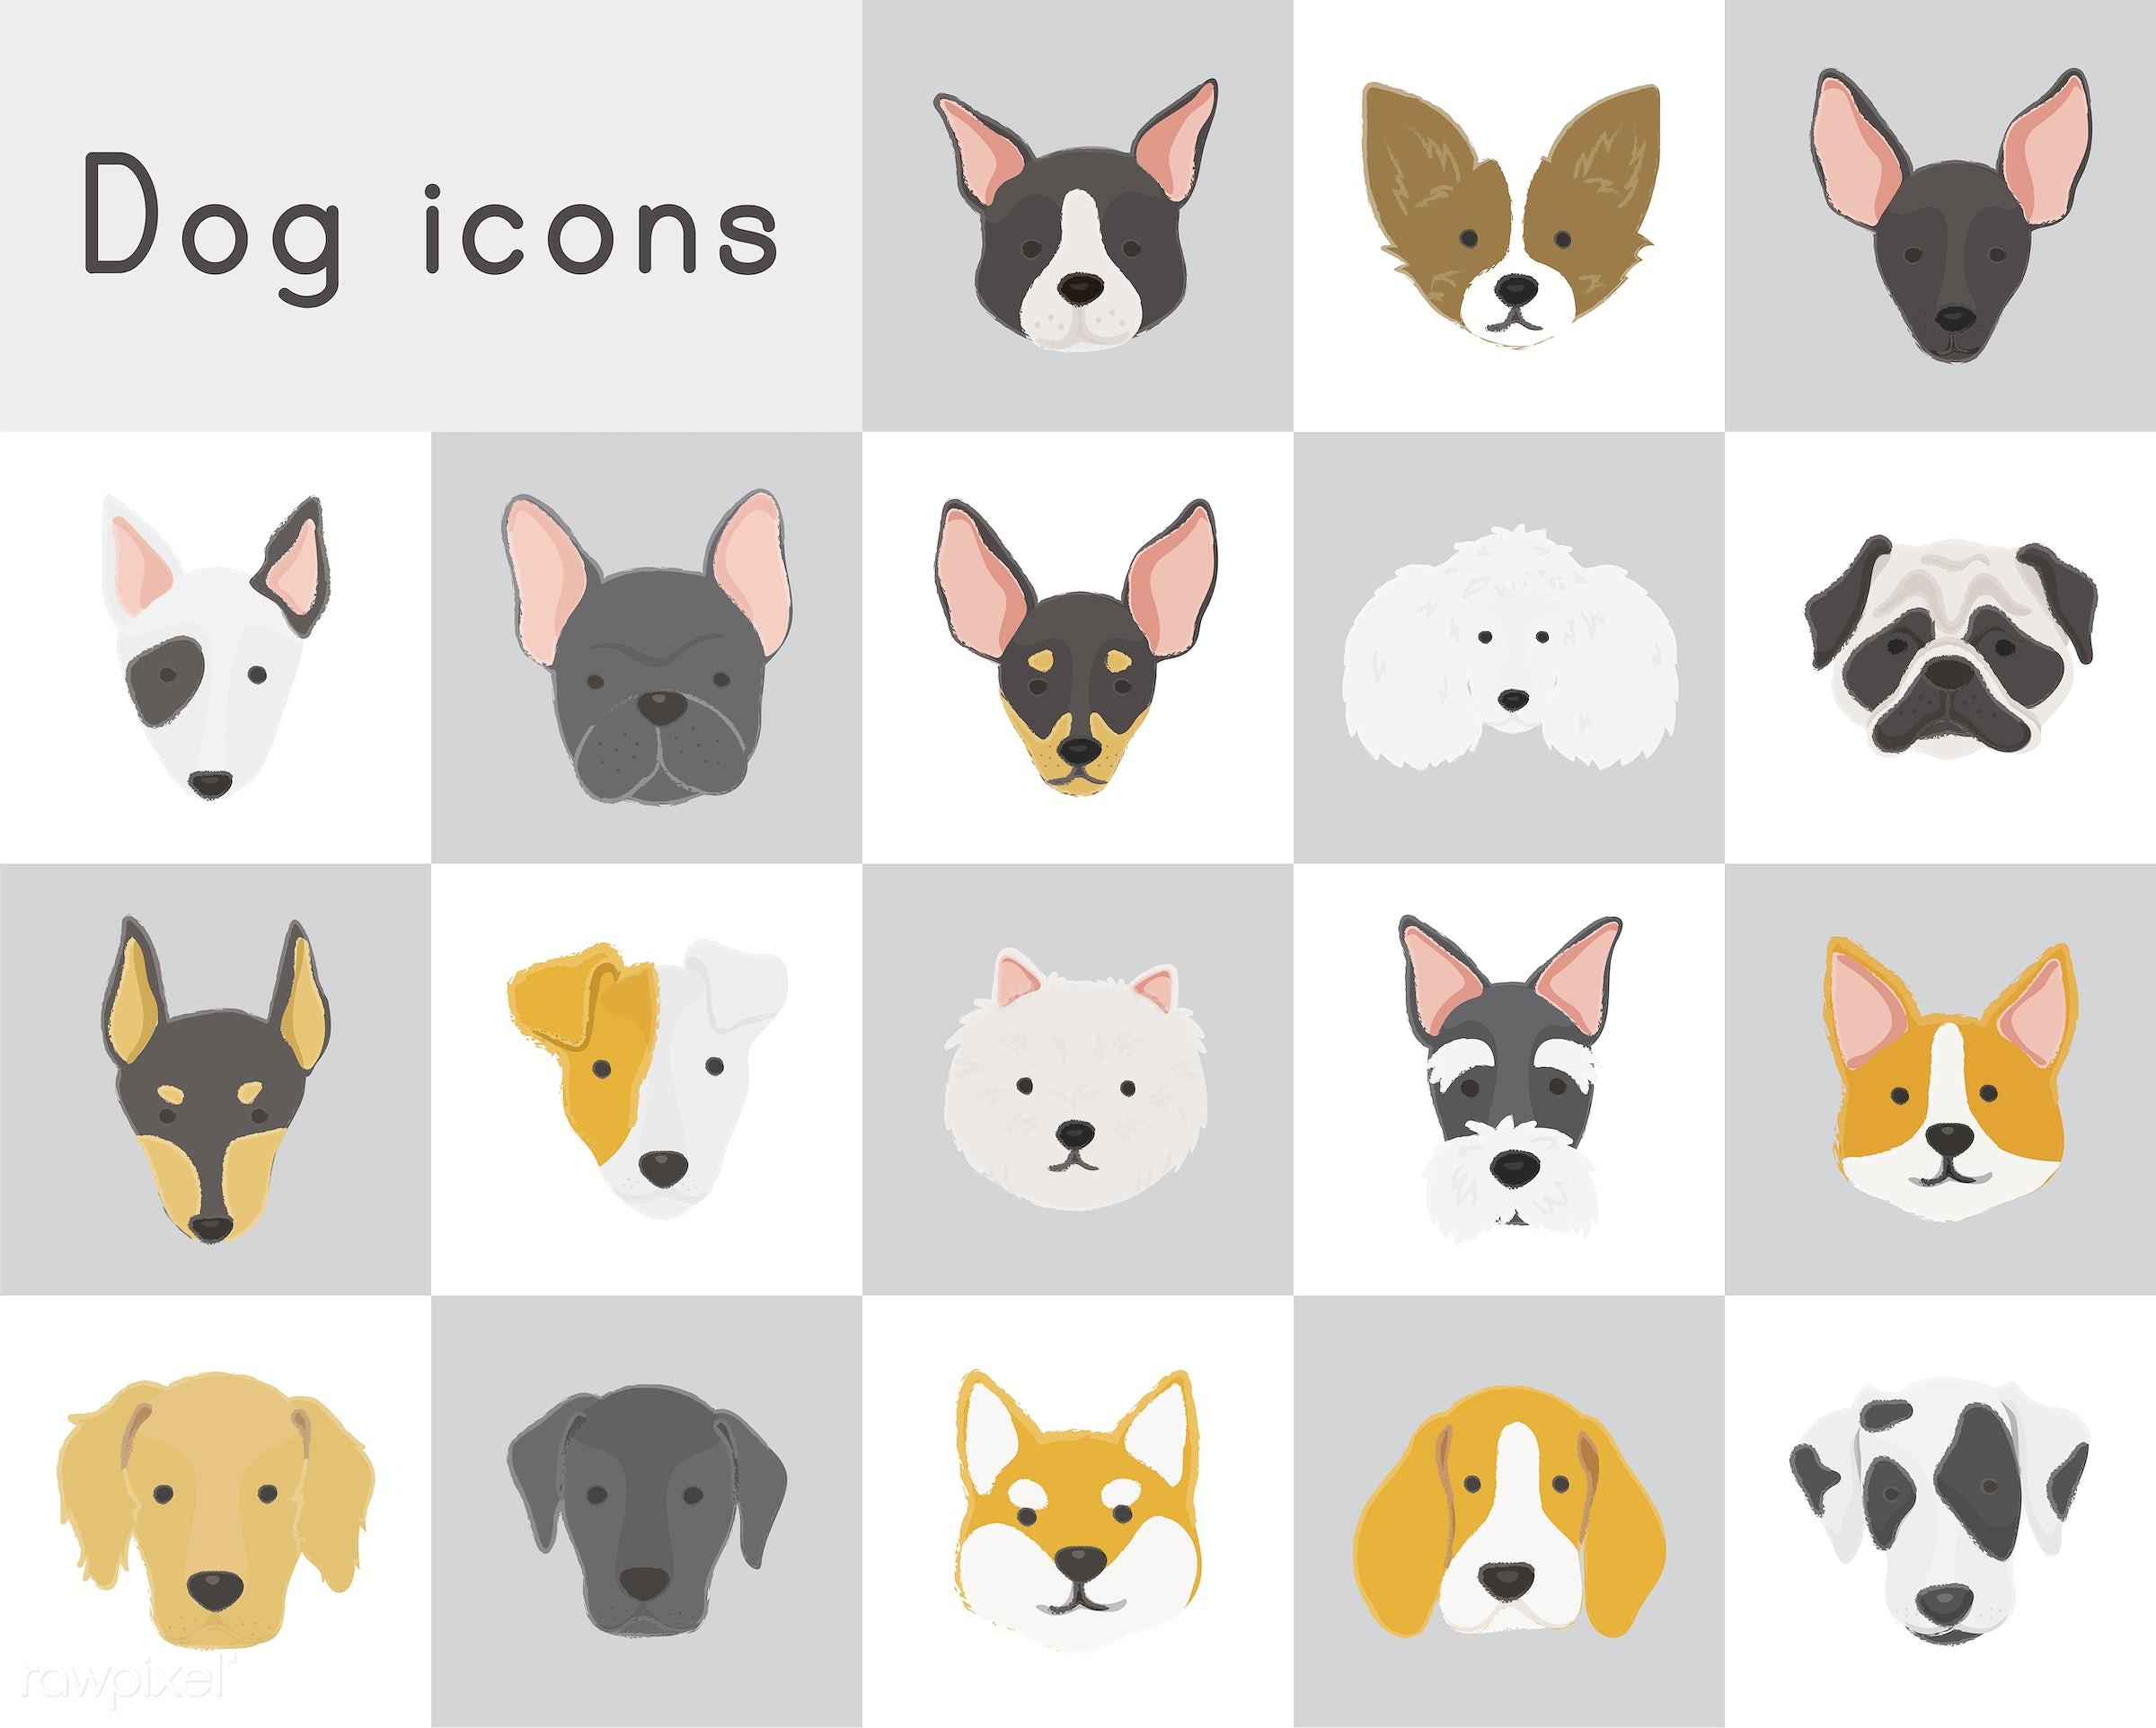 boston terrier, terrier, chihuahua, poodle, pembroke corgi, corgi, american eskimo, russell terrier, beagle, shiba inu,...